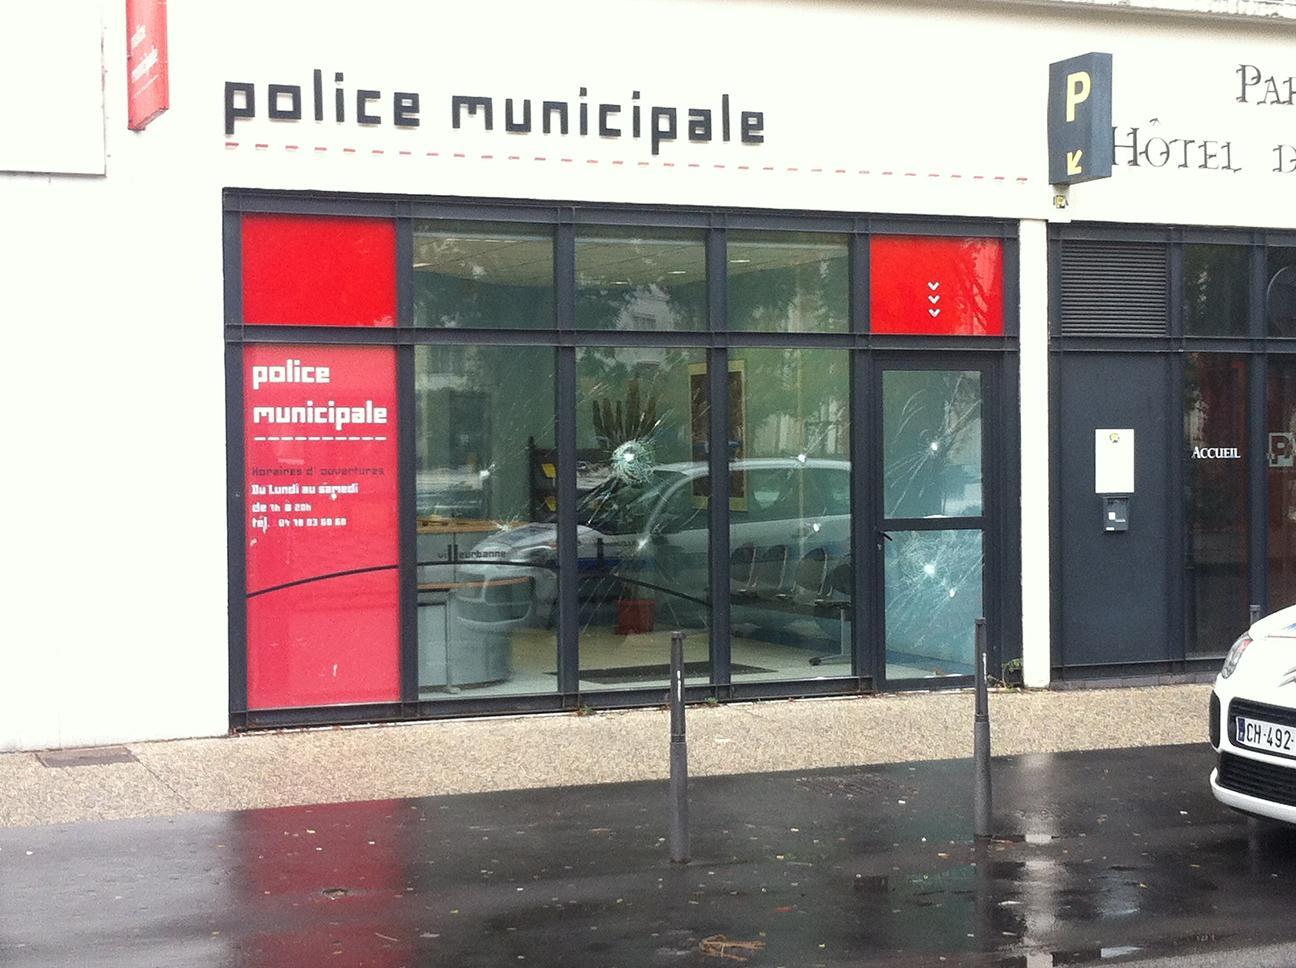 villeurbanne police municipale 14 11 2014